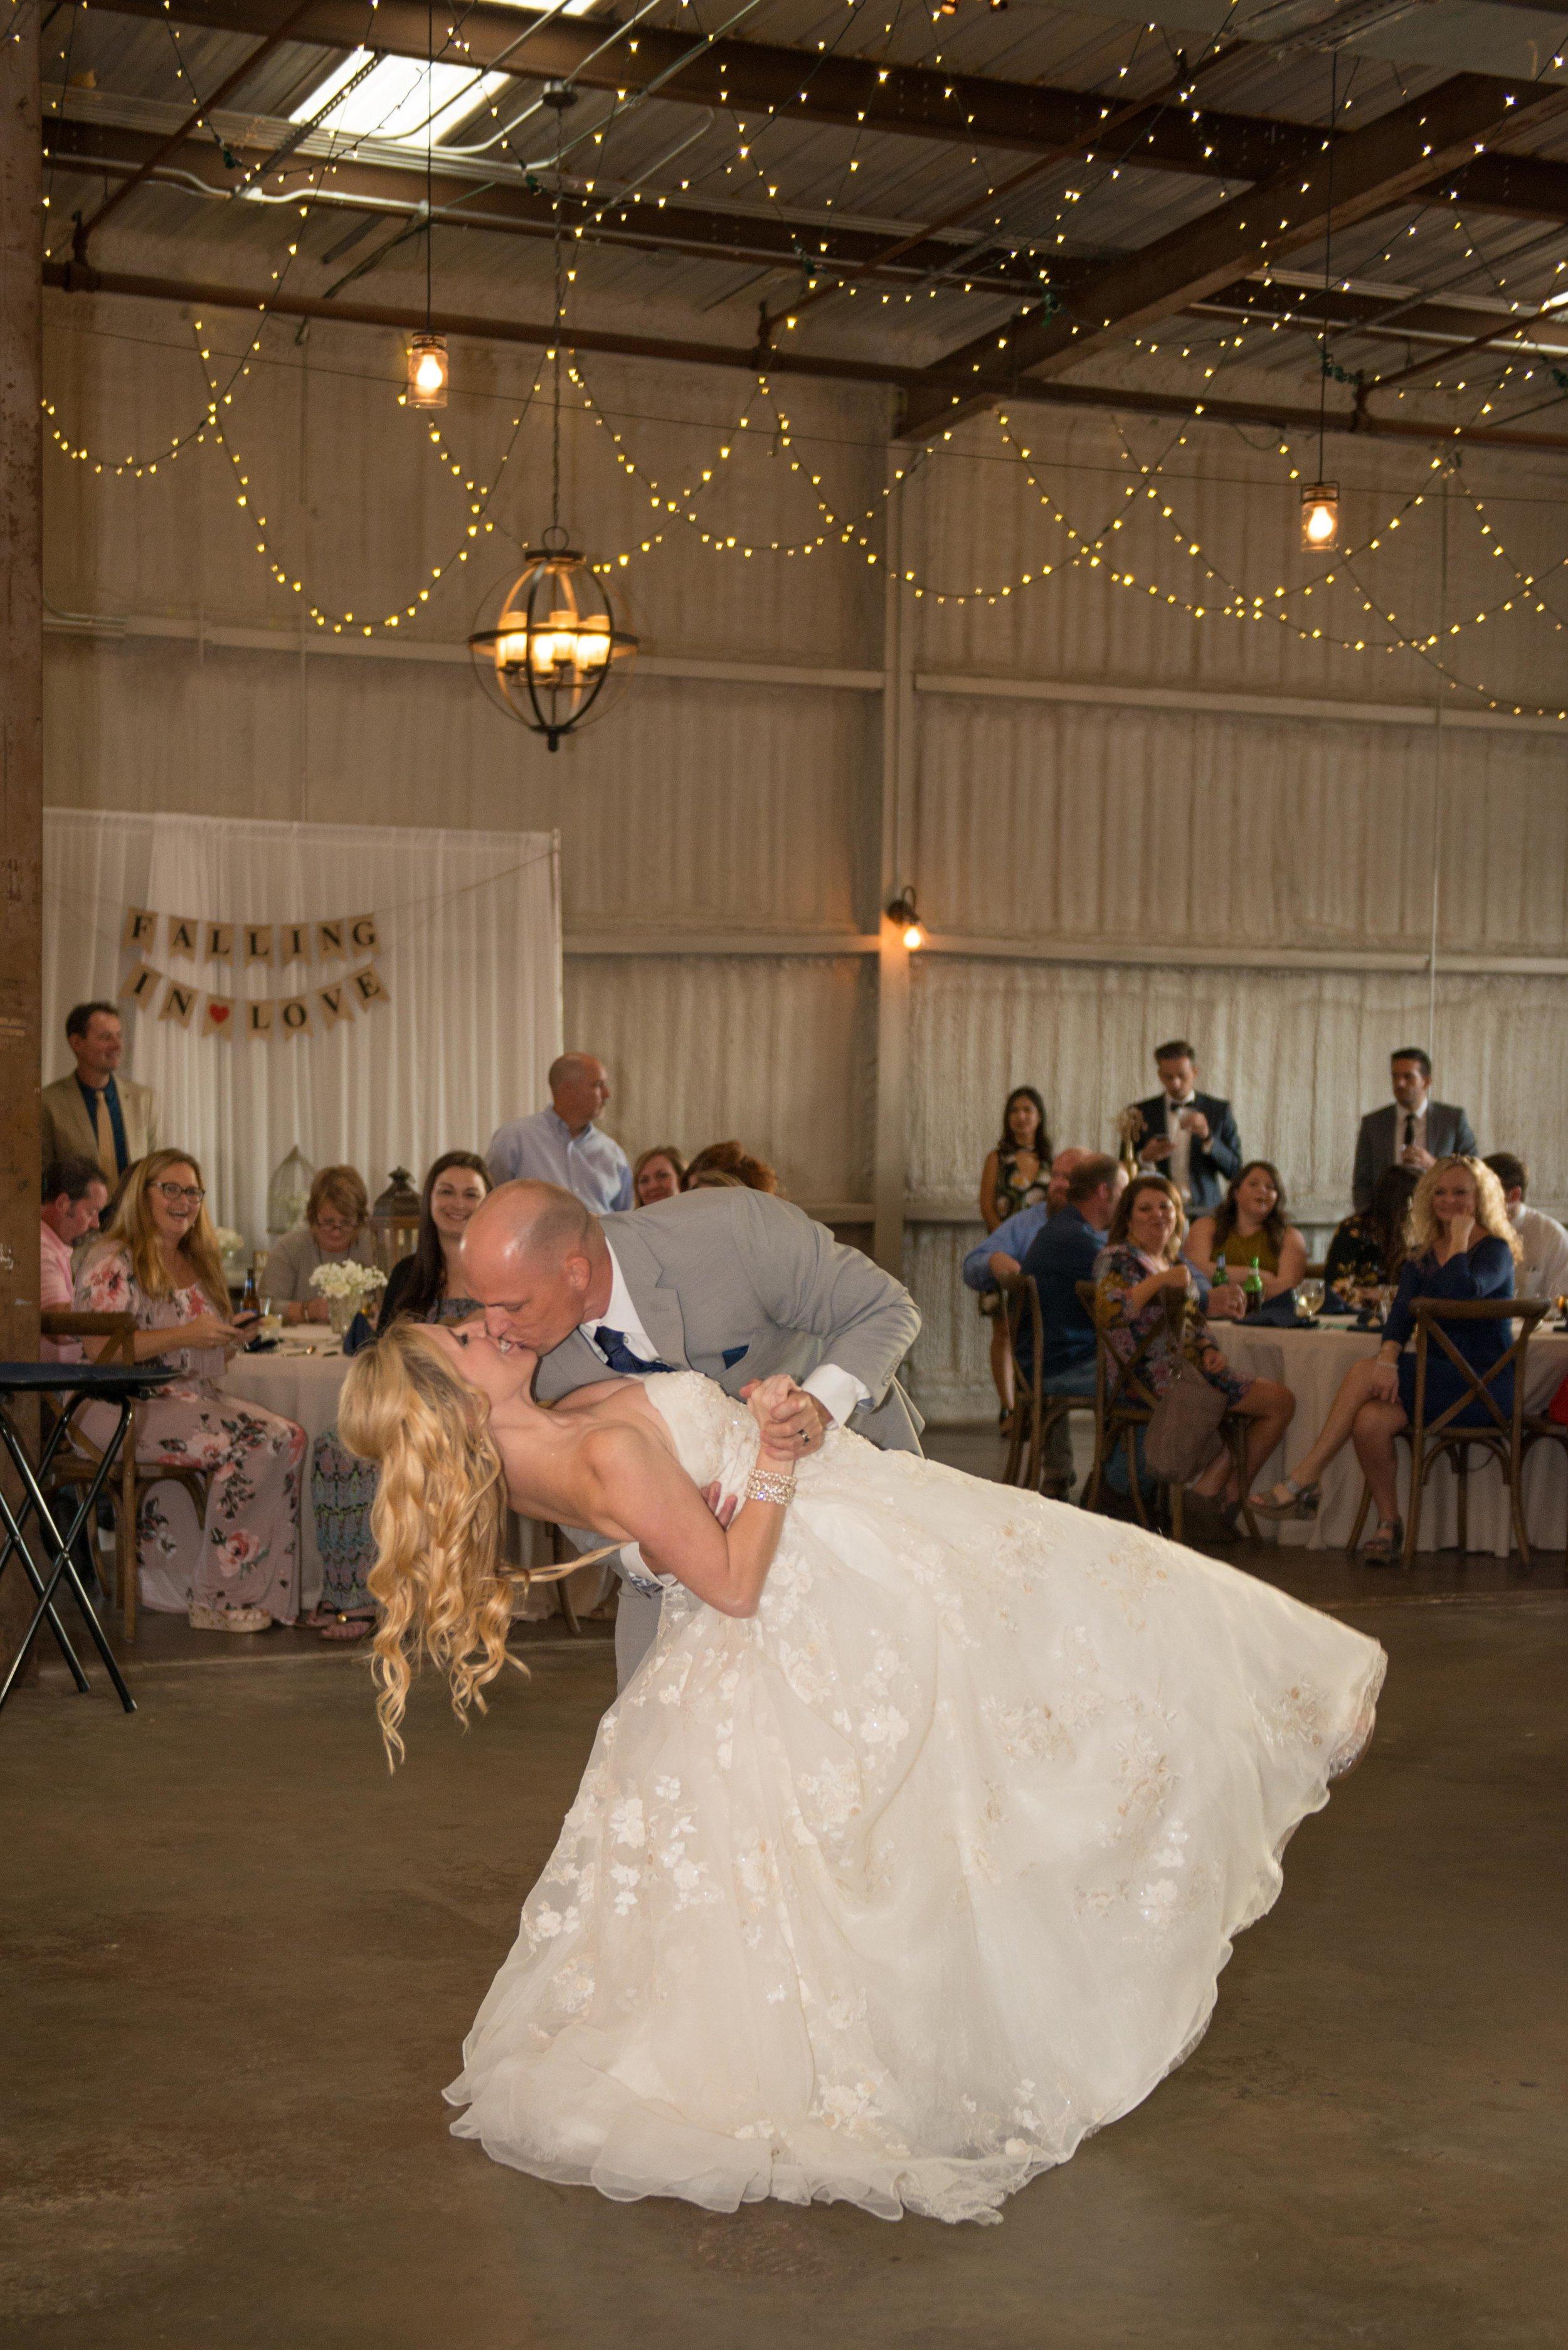 00001_Kuhnert-Wedding-94.jpg